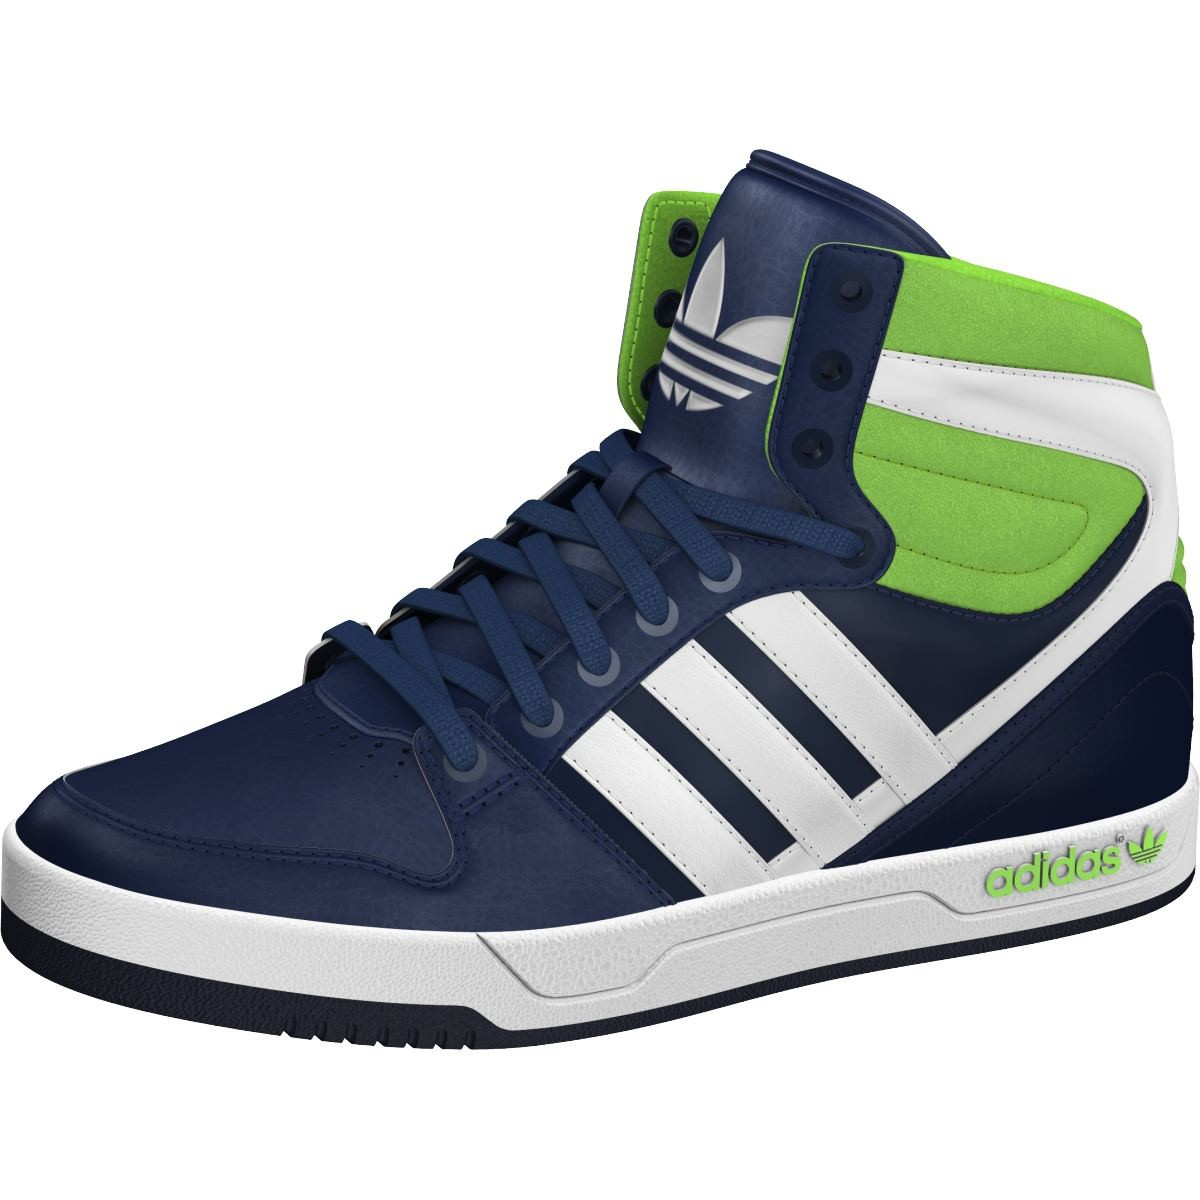 huge discount 0860a 65d45 Dětské boty adidas Originals COURT ATTITUDE K